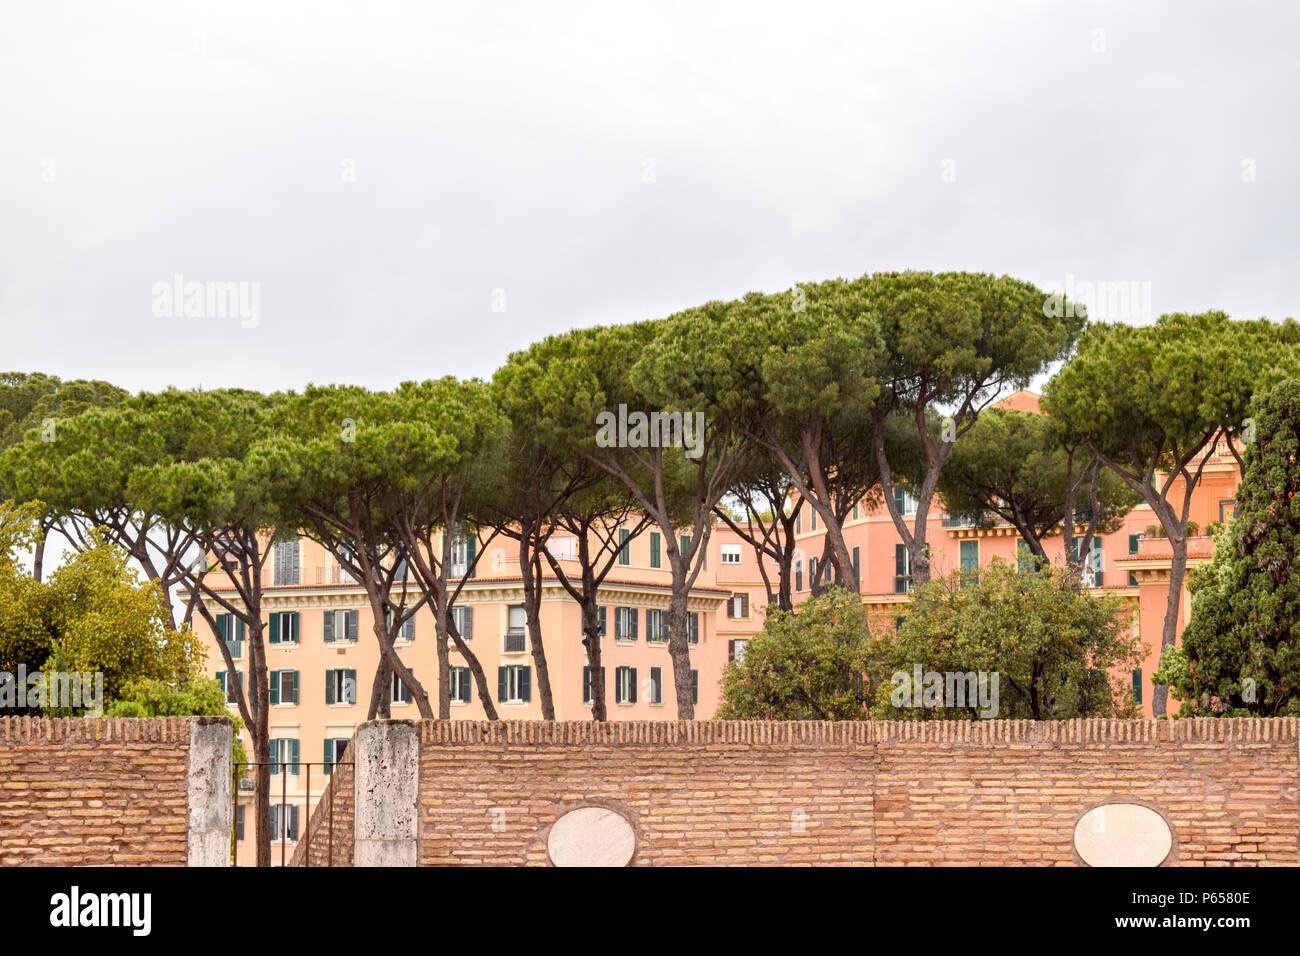 Italian Stone Pine - Landscape, Rome Italy - Stock Image